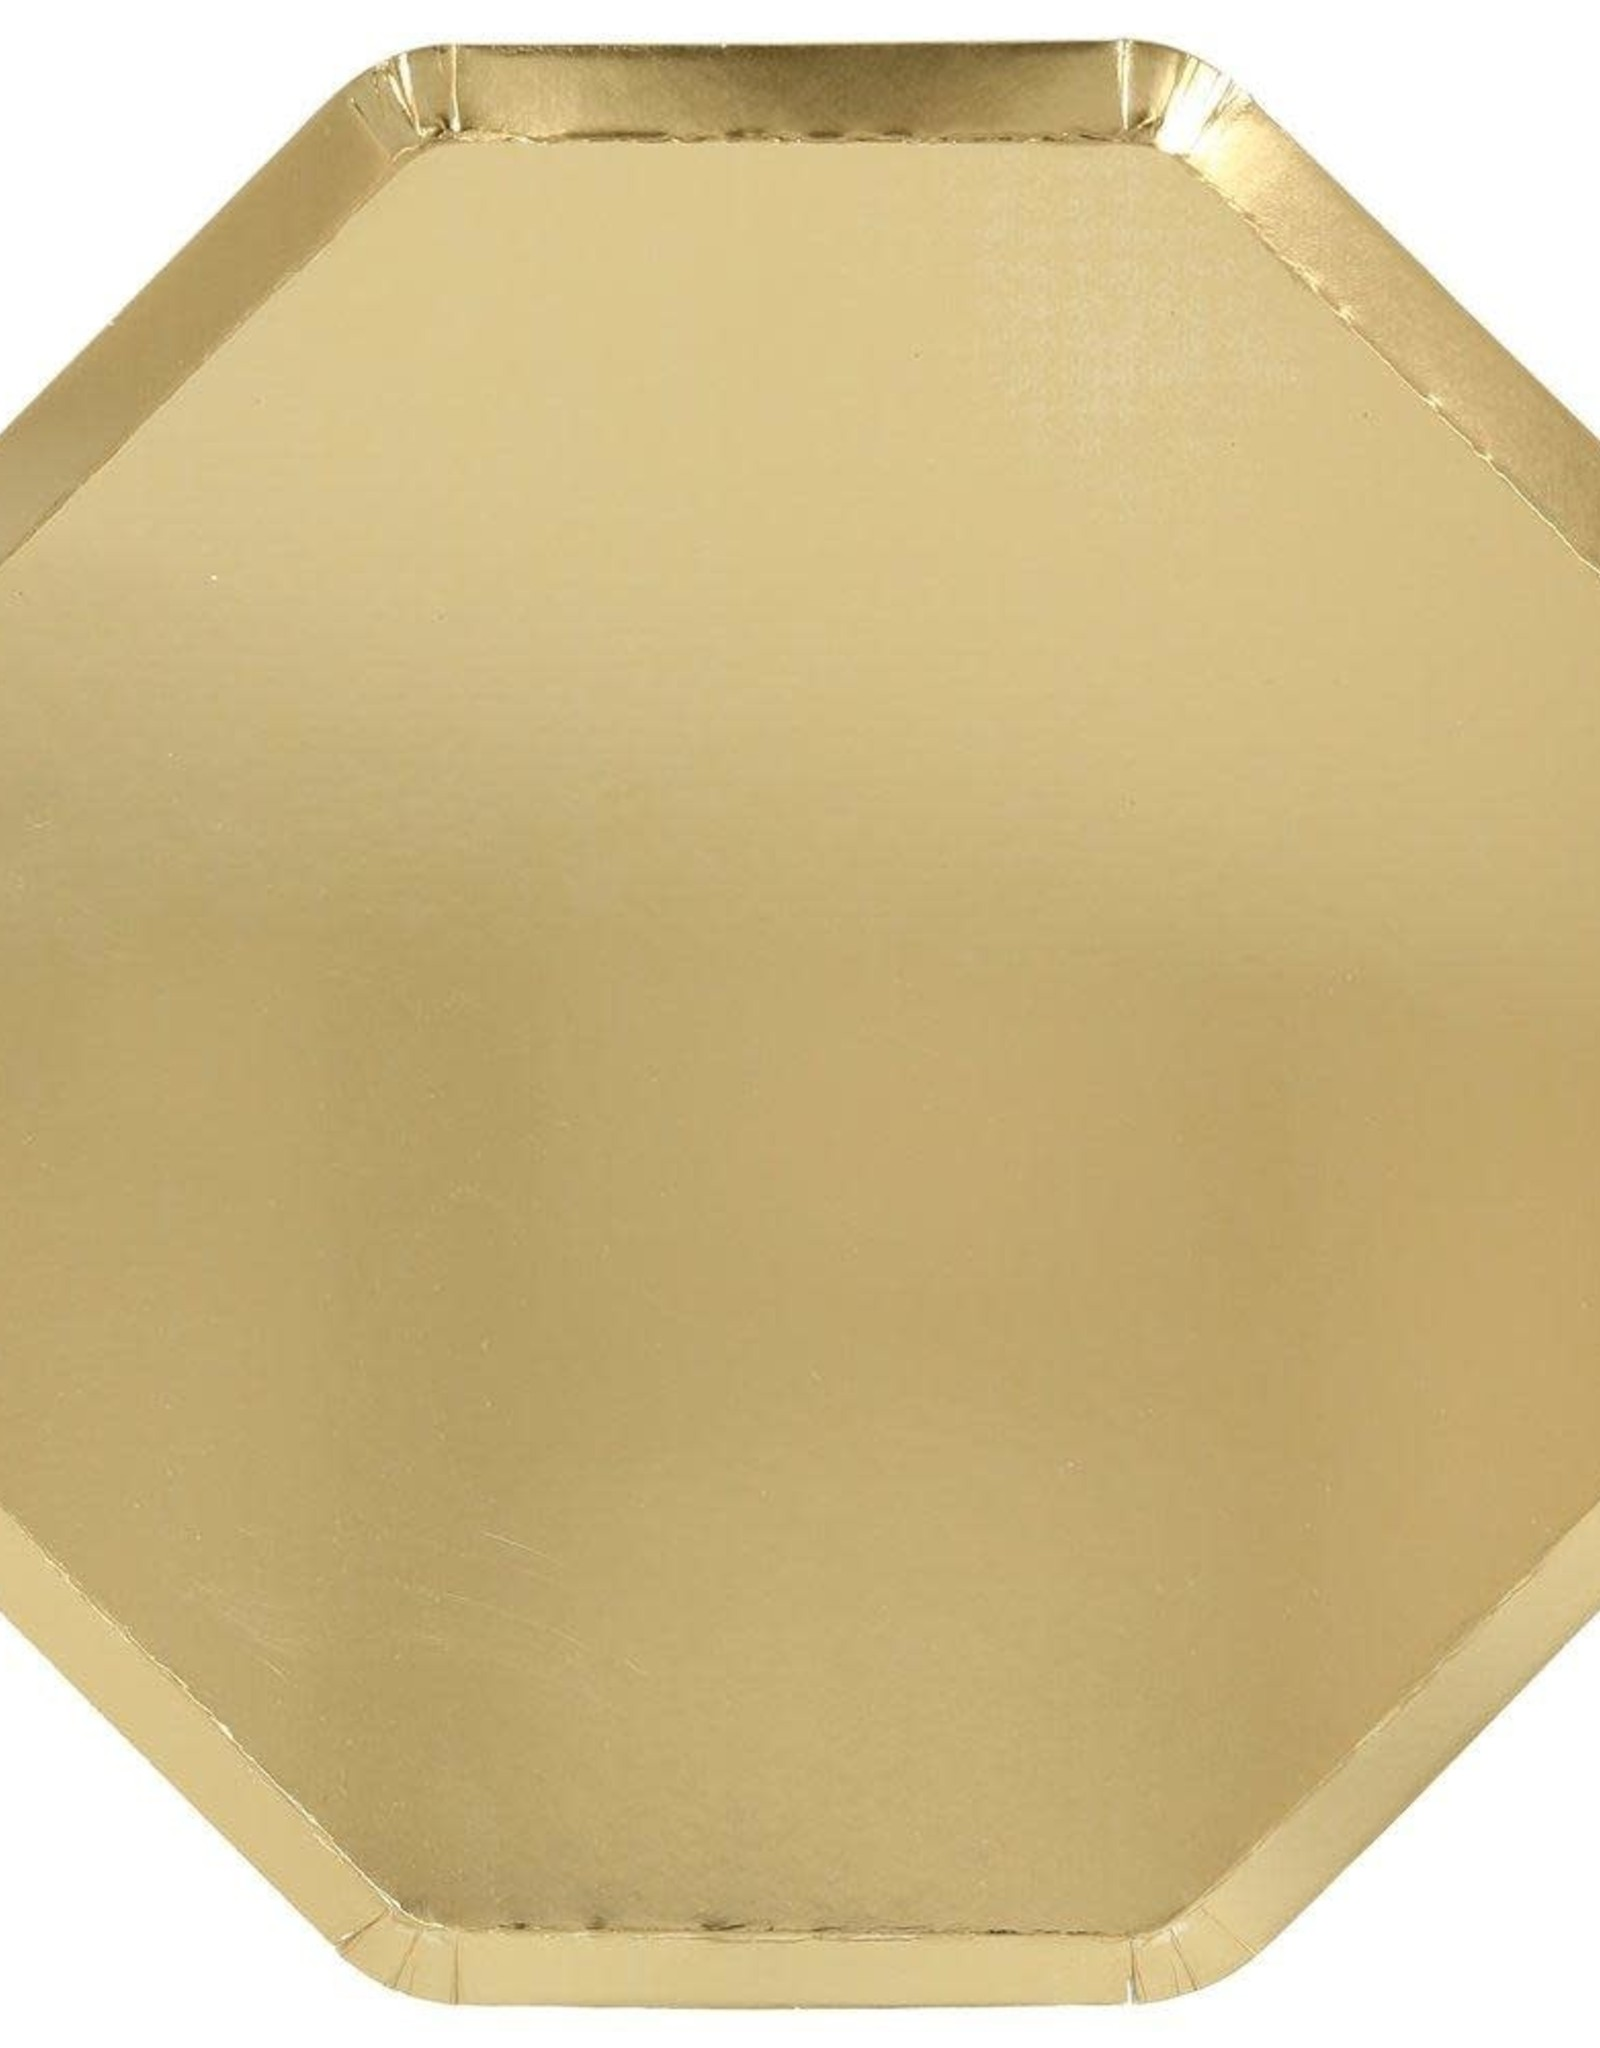 Meri Meri Meri Meri | Gold Dinner Plates (set of 8)